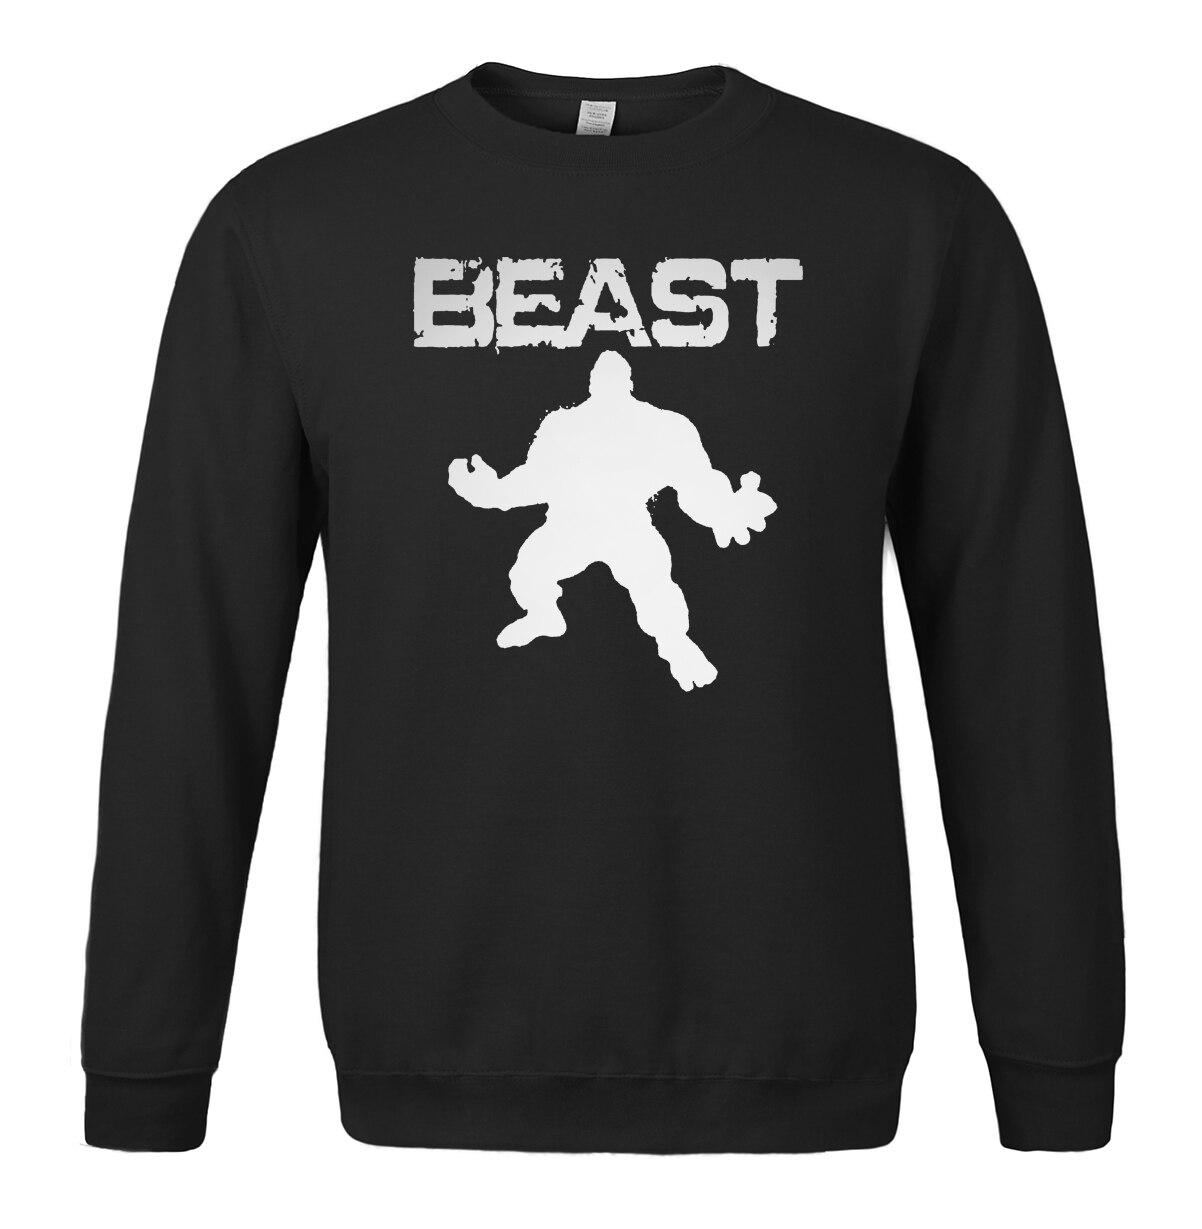 Men Hoodies 2019 New Style Spring Winter Sweatshirts Fleece Hoodies Men Tracksuit Loose Fit Hoodi Bodybuilding Streetwear